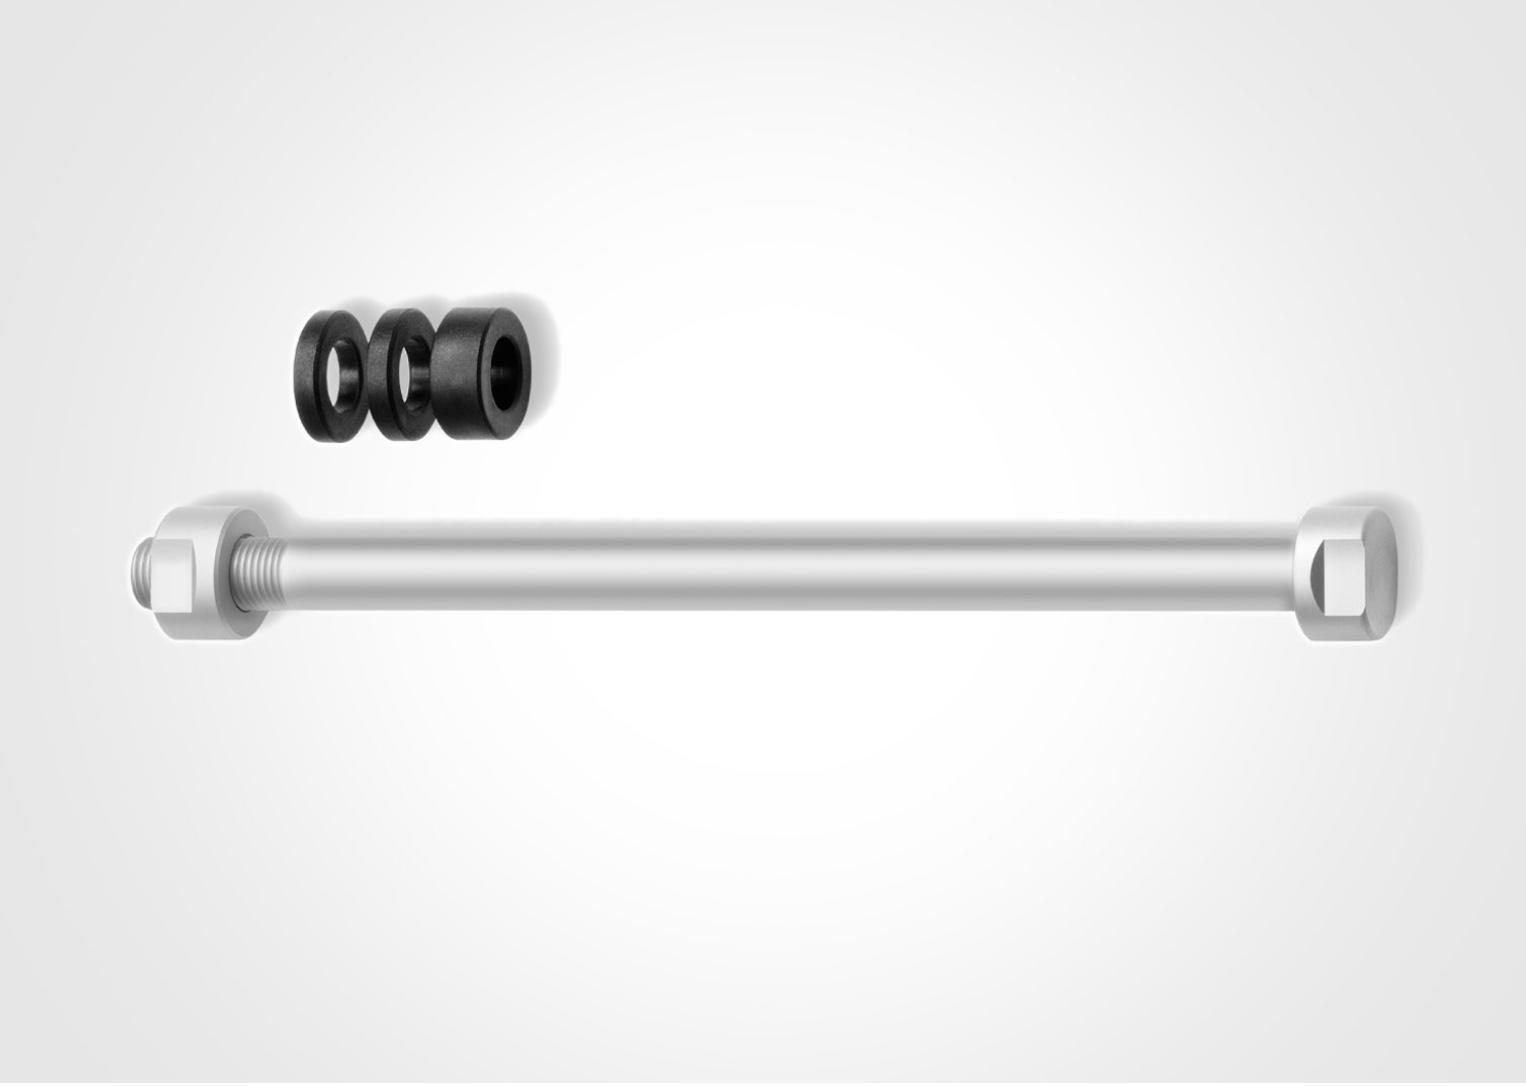 Tacx E-Thru aksel M12x1 til hometrainer - T1707   item_misc